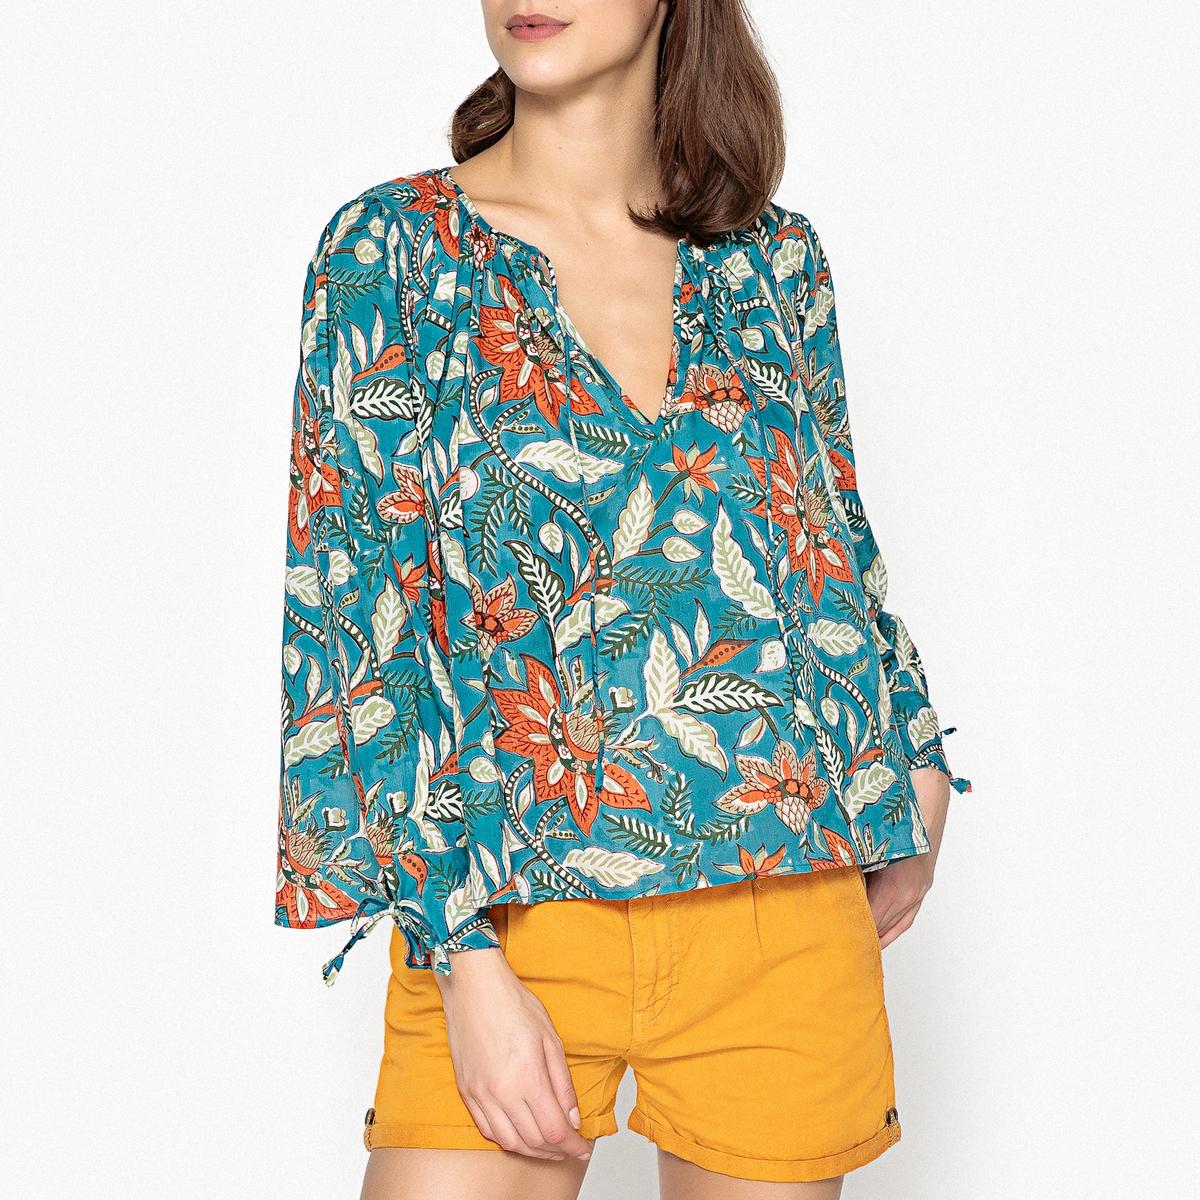 Блузка с рисунком и рукавами с напуском KALAO BLOUSE blouse luxmix blouse